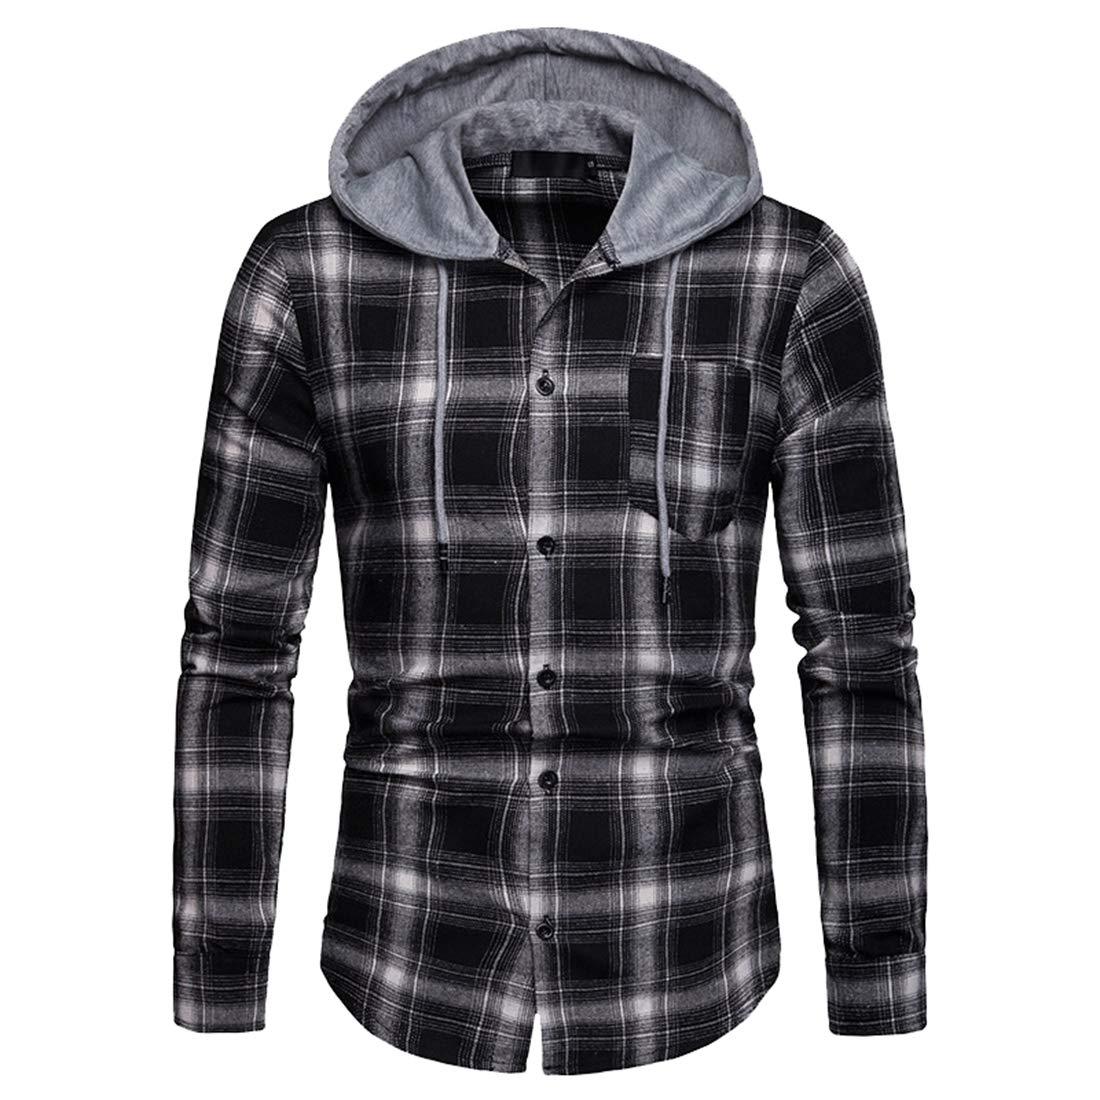 Generic Mens Business Plaid Long Sleeve Curved Hem Button Down Shirt Hoodie Shirt